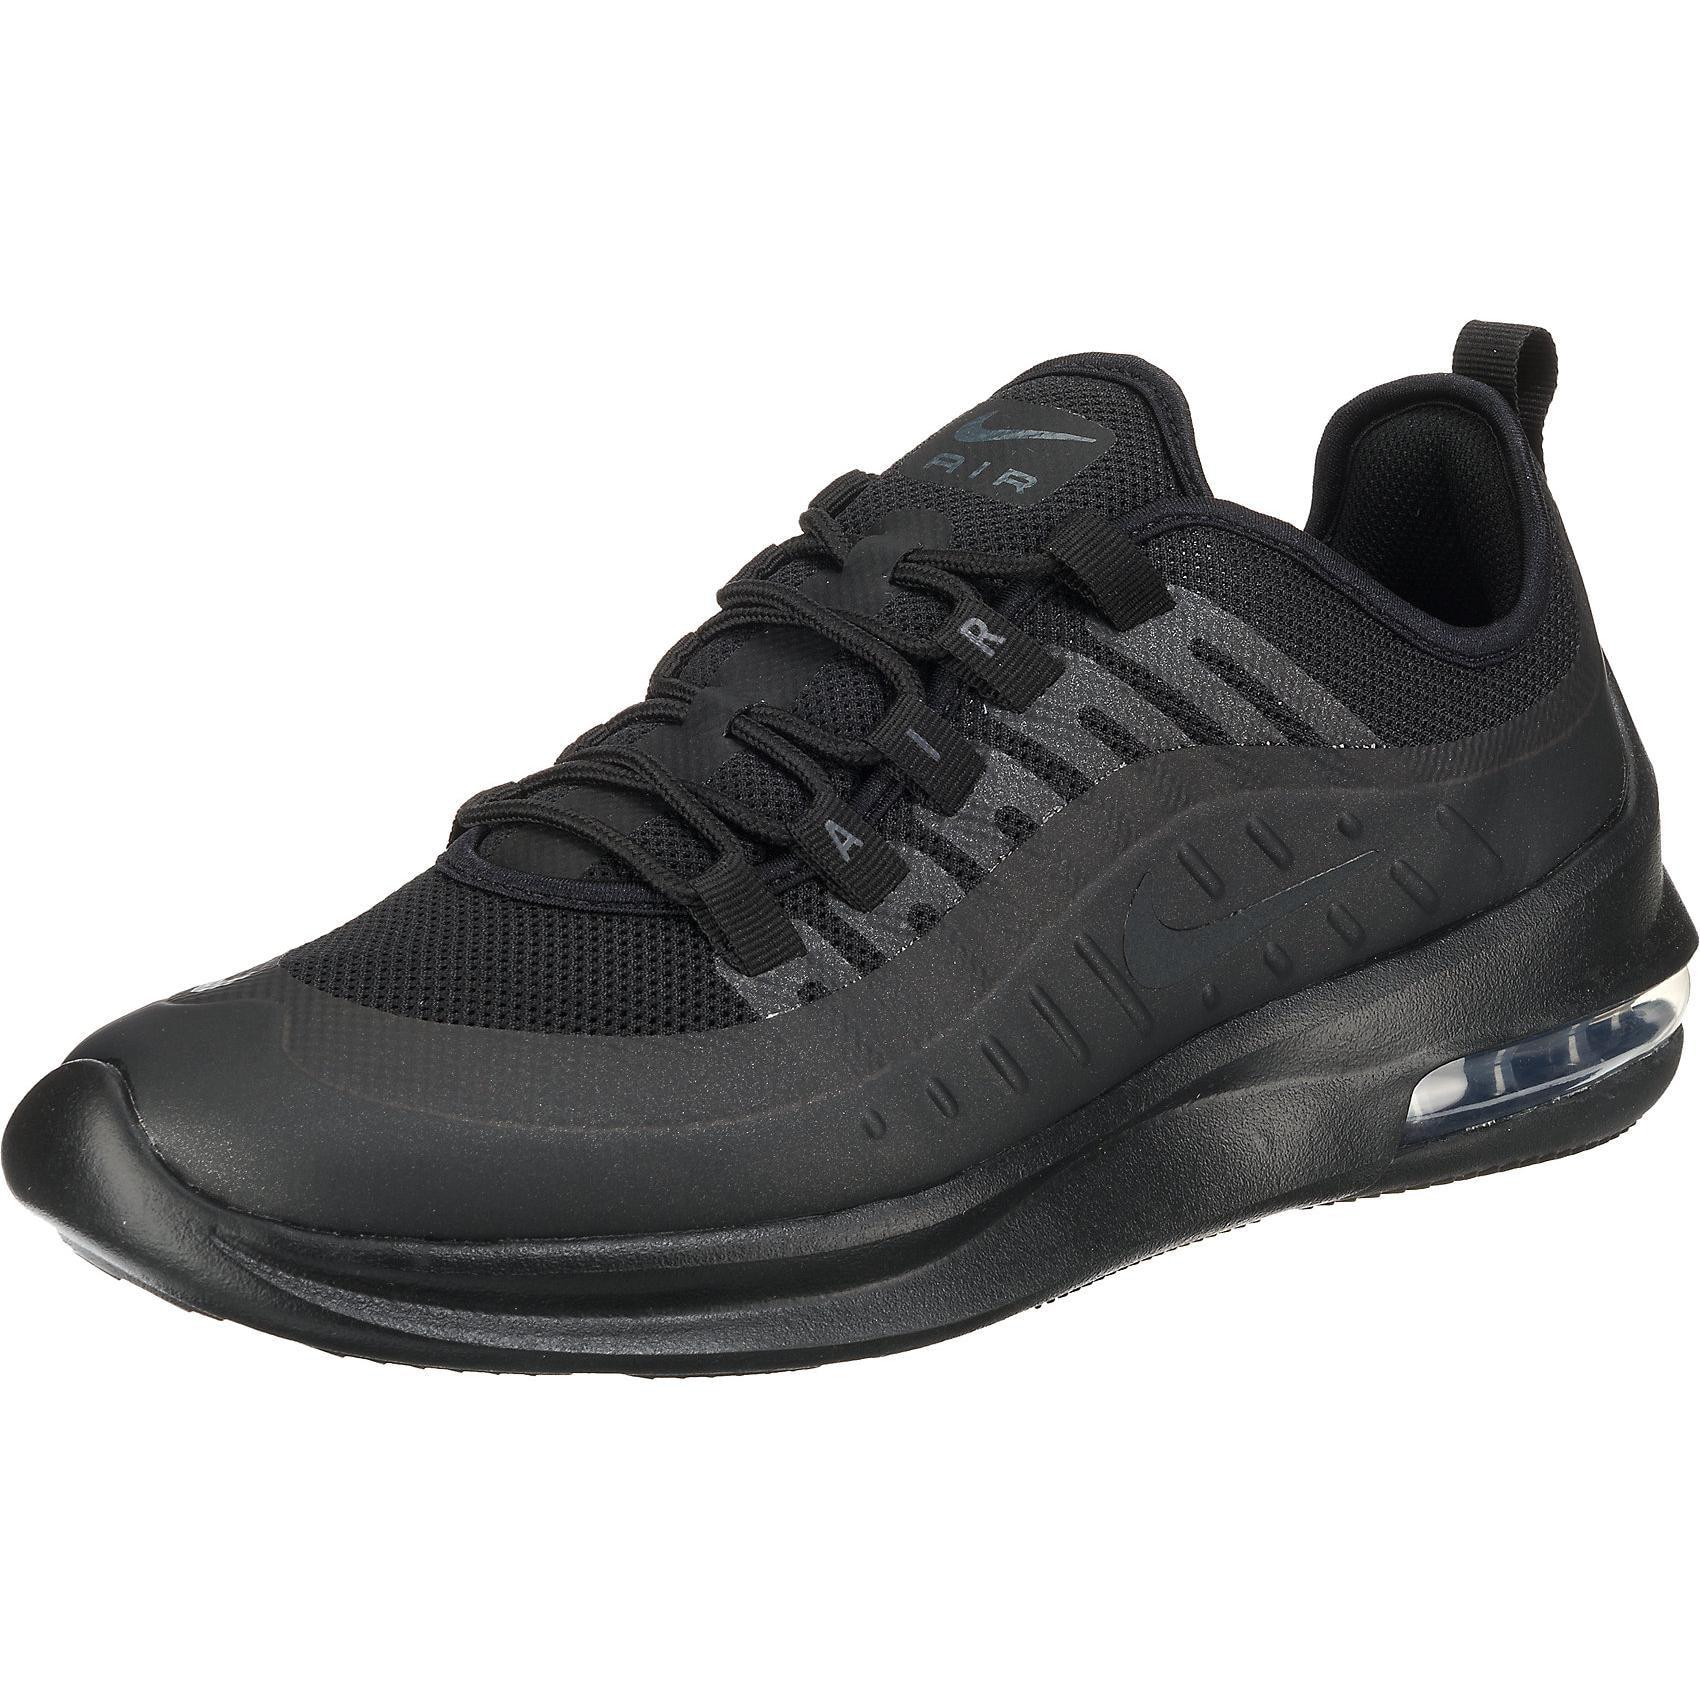 d85e1ddbe2fb2f Herren-Schnürschuhe & Sneaker online bestellen » REWE